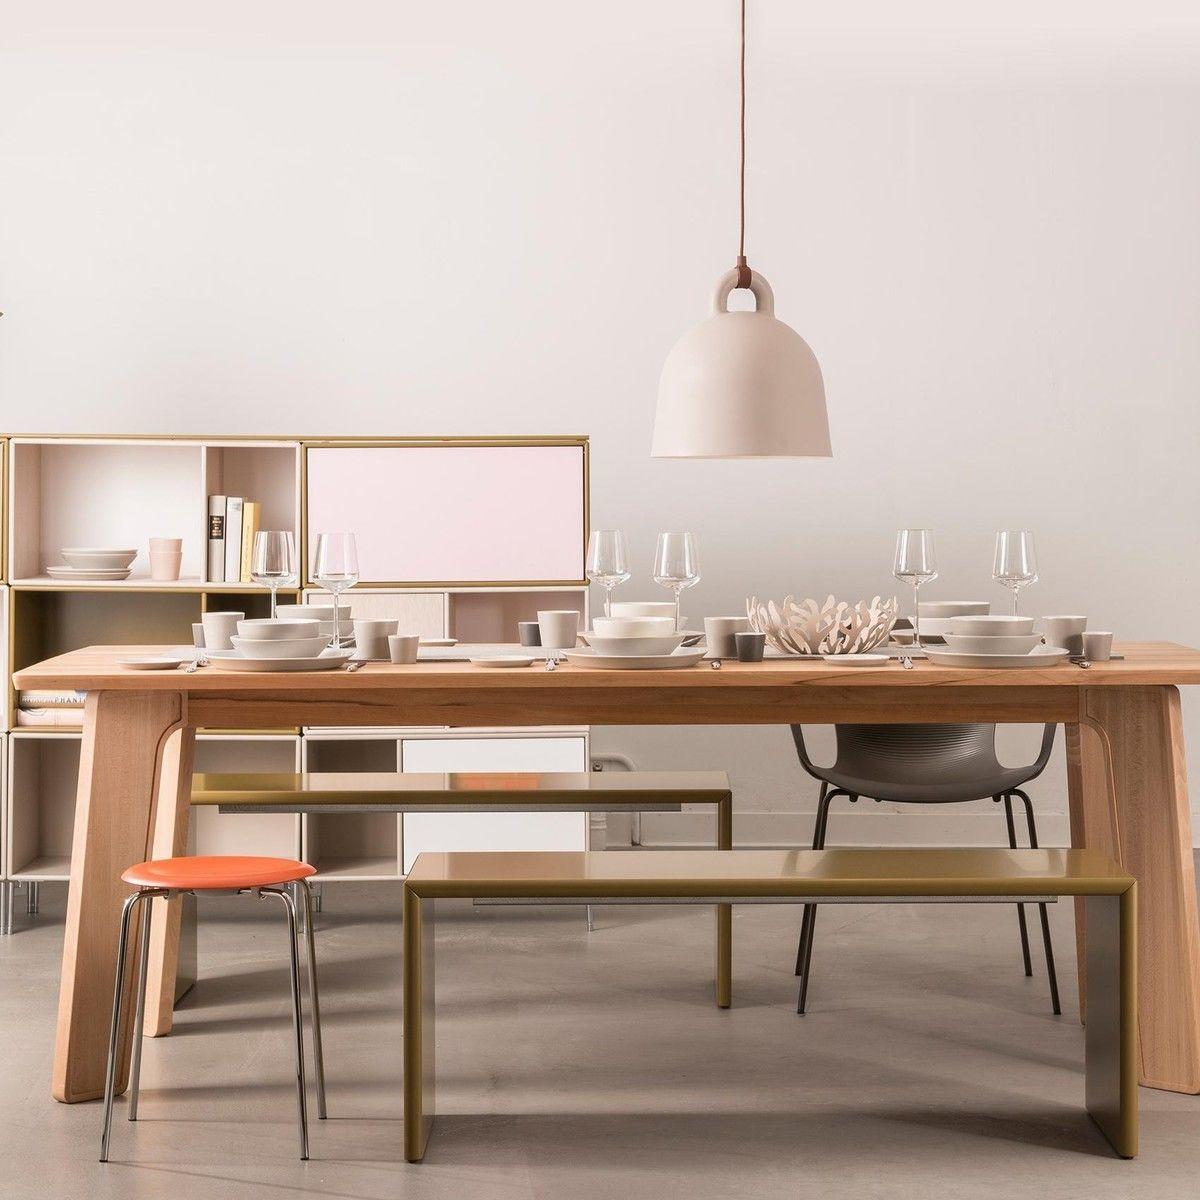 tonale set bowl alessi. Black Bedroom Furniture Sets. Home Design Ideas